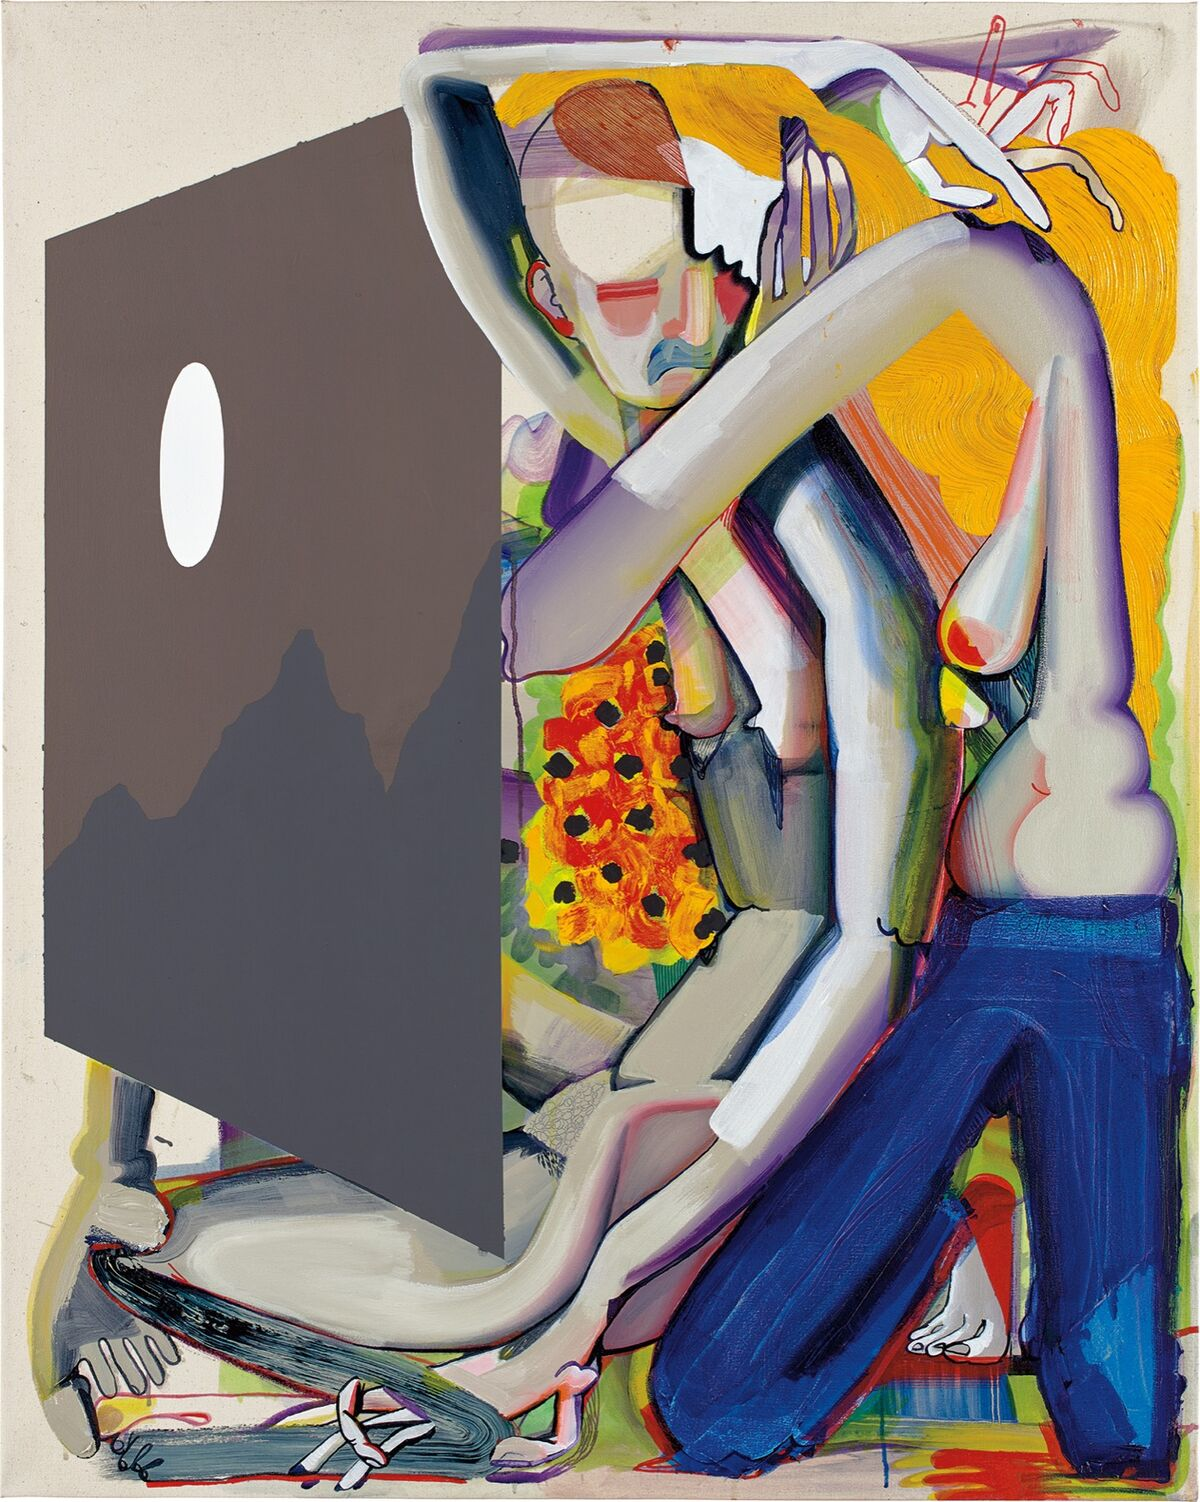 Christina Quarles, Moon (Lez Go Out N' Feel Tha Nite), 2017. Courtesy of Phillips.